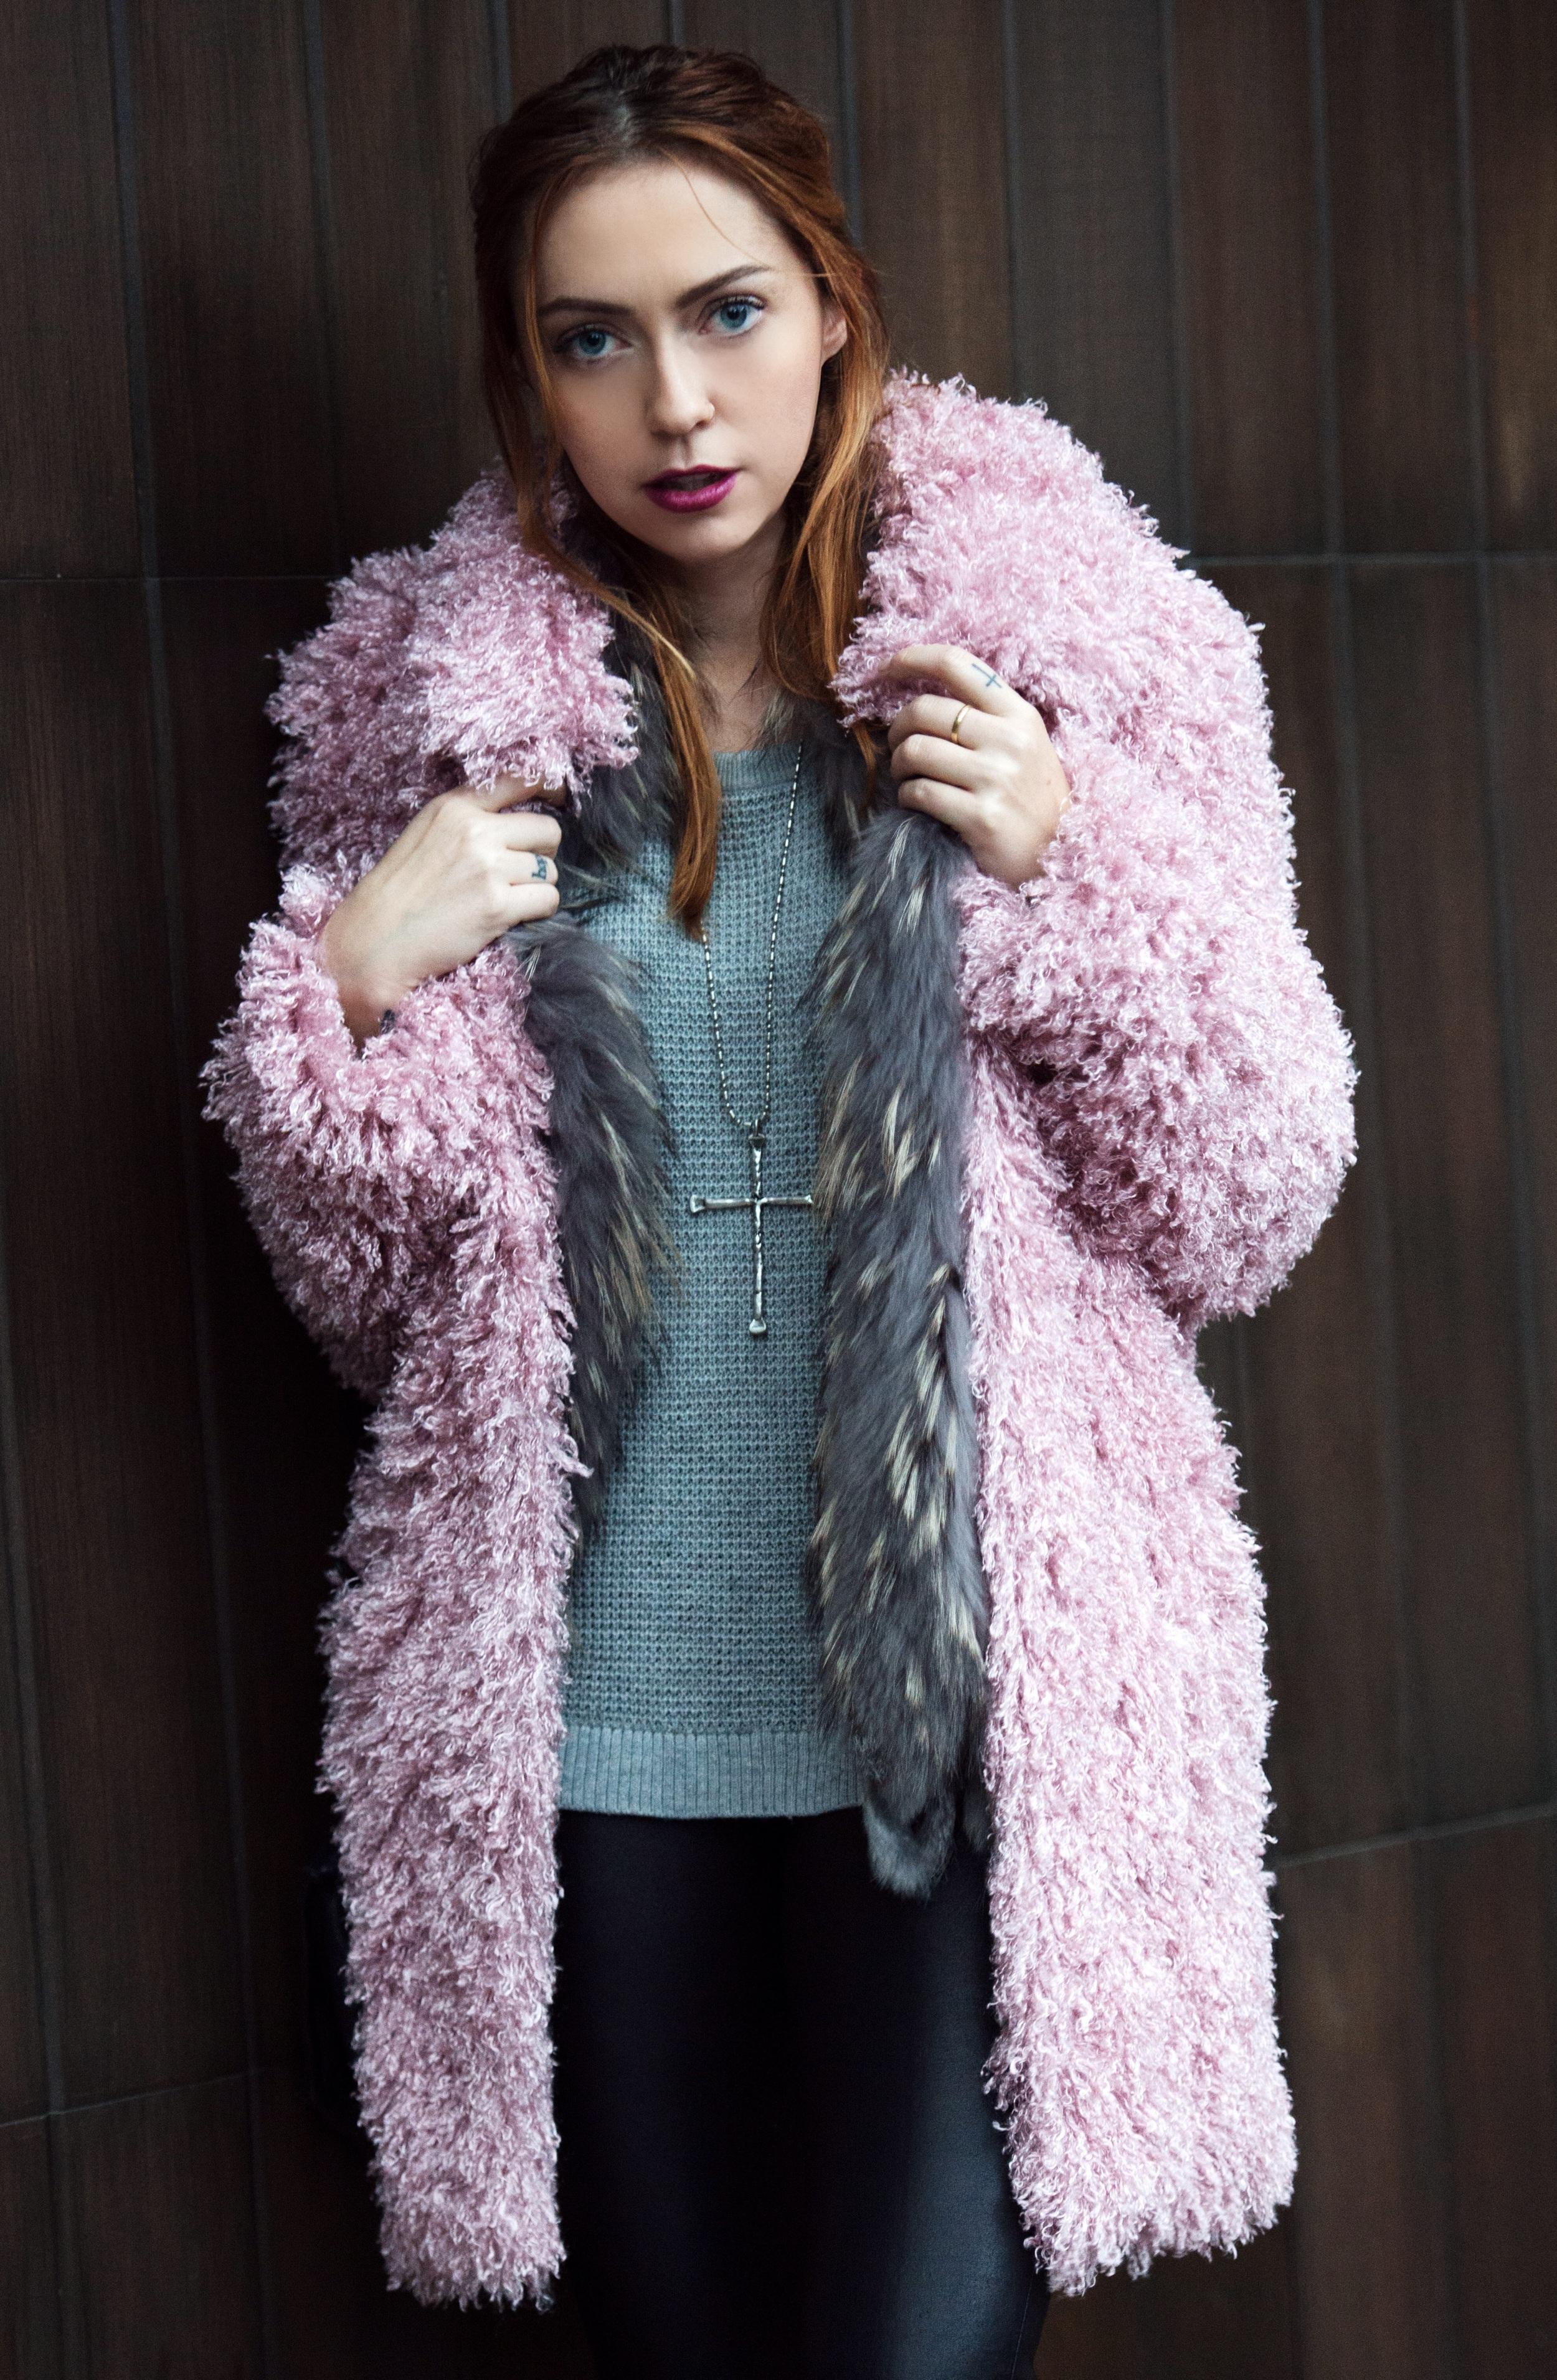 Coat - UnReal Fur  | Sweater - Rag & Bone | Vest - vintage | Pants - Topshop | Shoes - Acne Studios | Bag - Givenchy||  photos by Piper Rastello